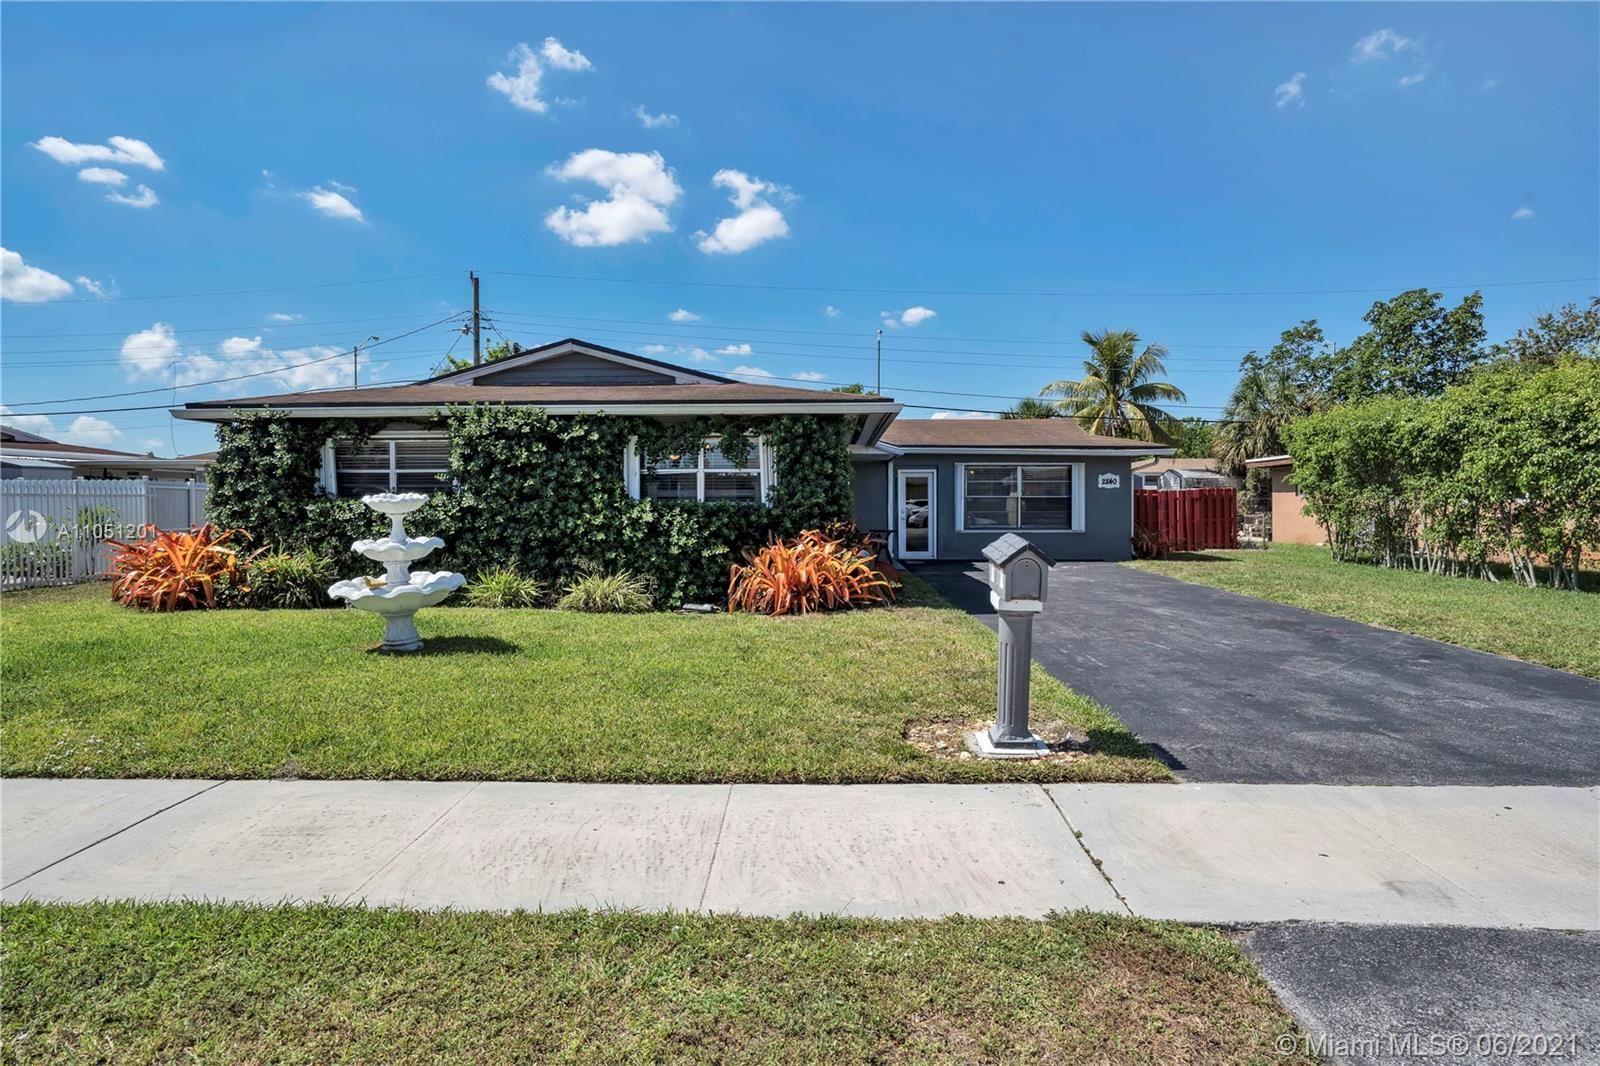 2840 NW 184th St, Miami Gardens, FL 33056 - #: A11051201